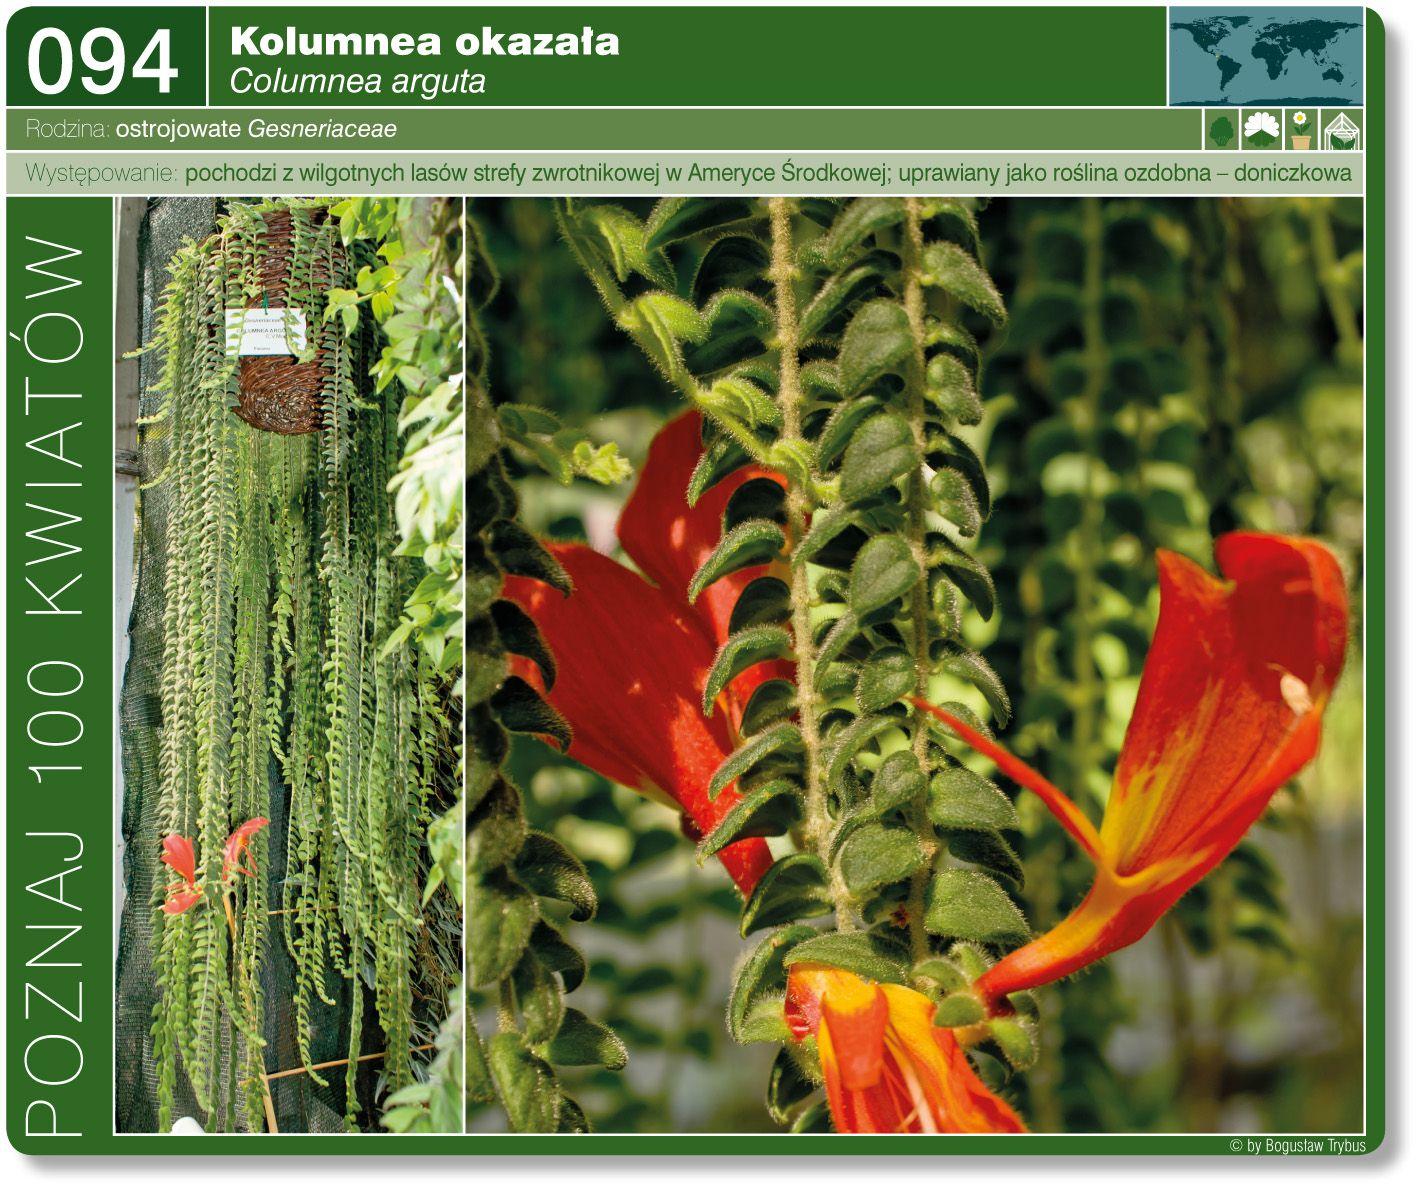 Kolumnea Okazala Plants Flowers Love Lies Bleeding